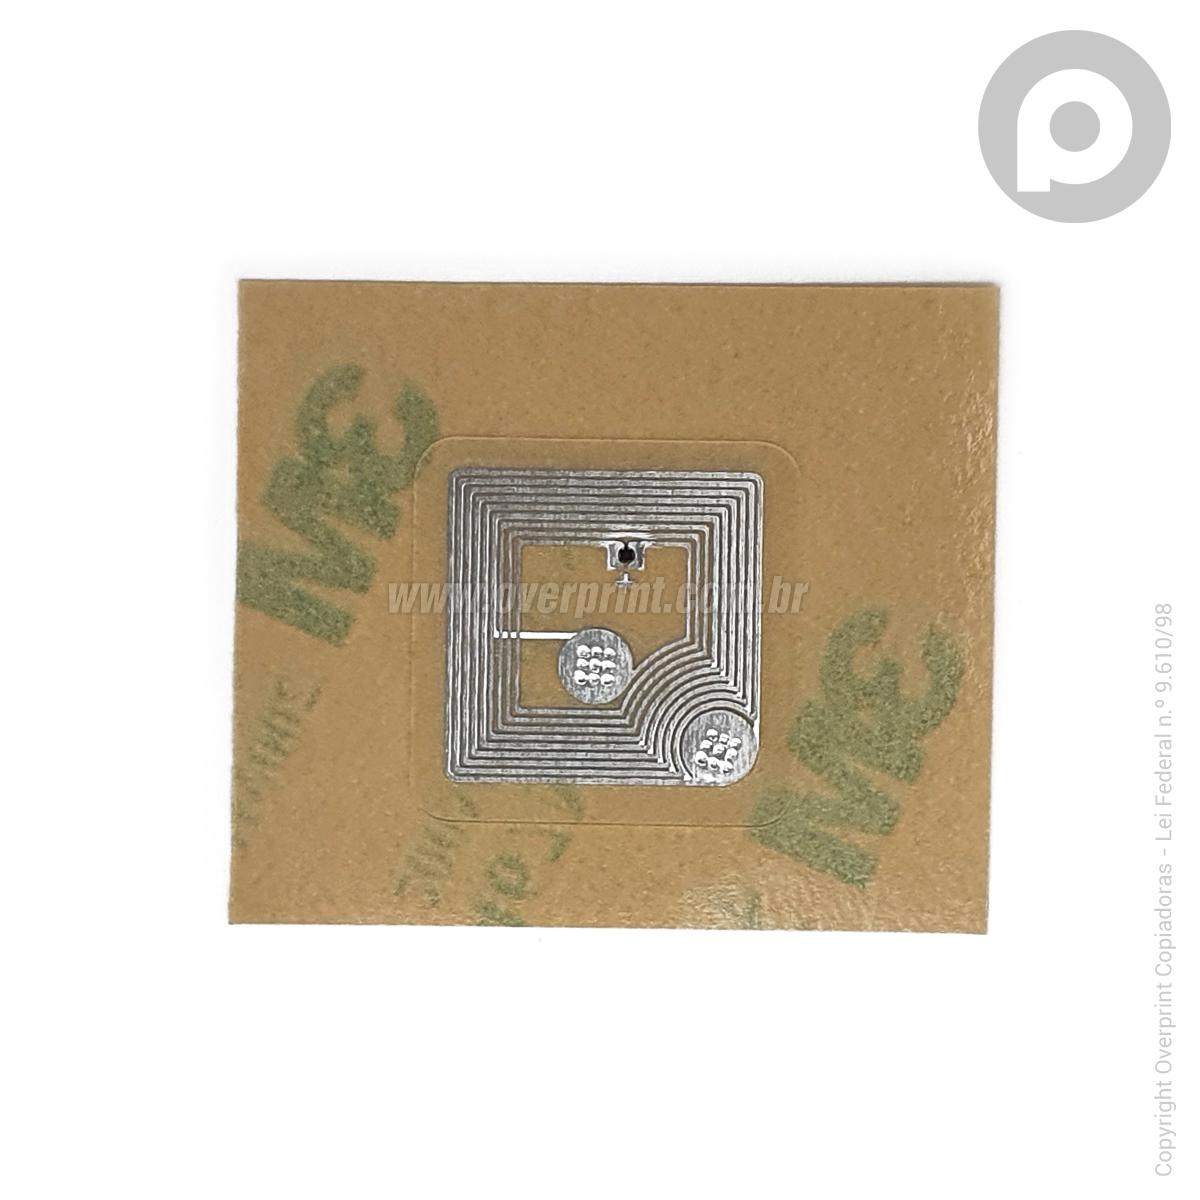 Chip Toner Xerox WorkCentre 5945 / 5955 Preto  - Overprint